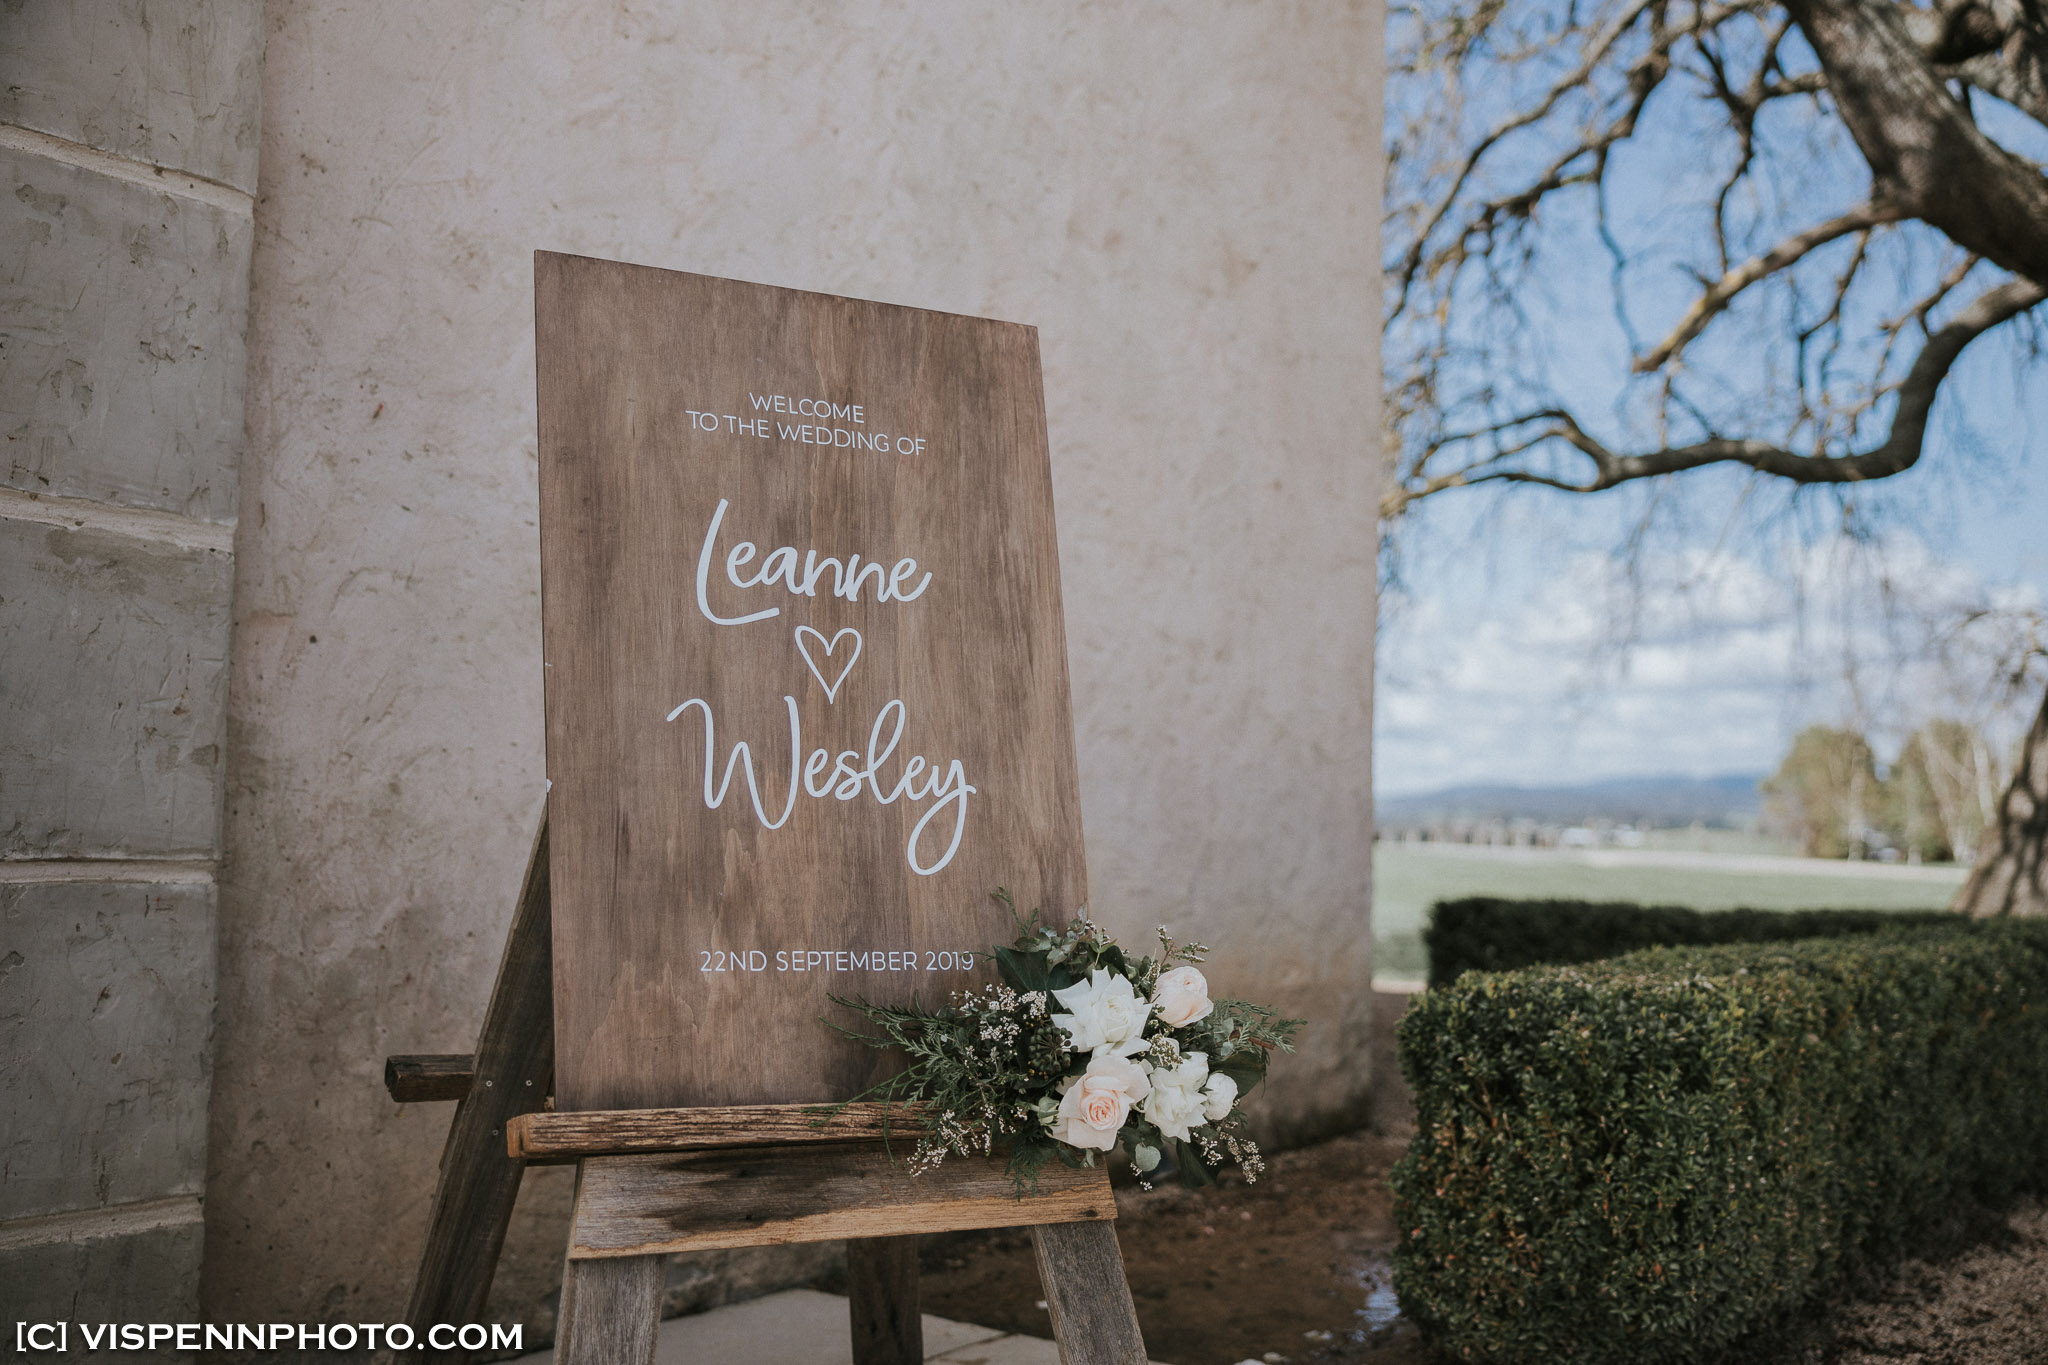 WEDDING DAY Photography Melbourne LeanneWesley 02509 1P EOSR ZHPENN